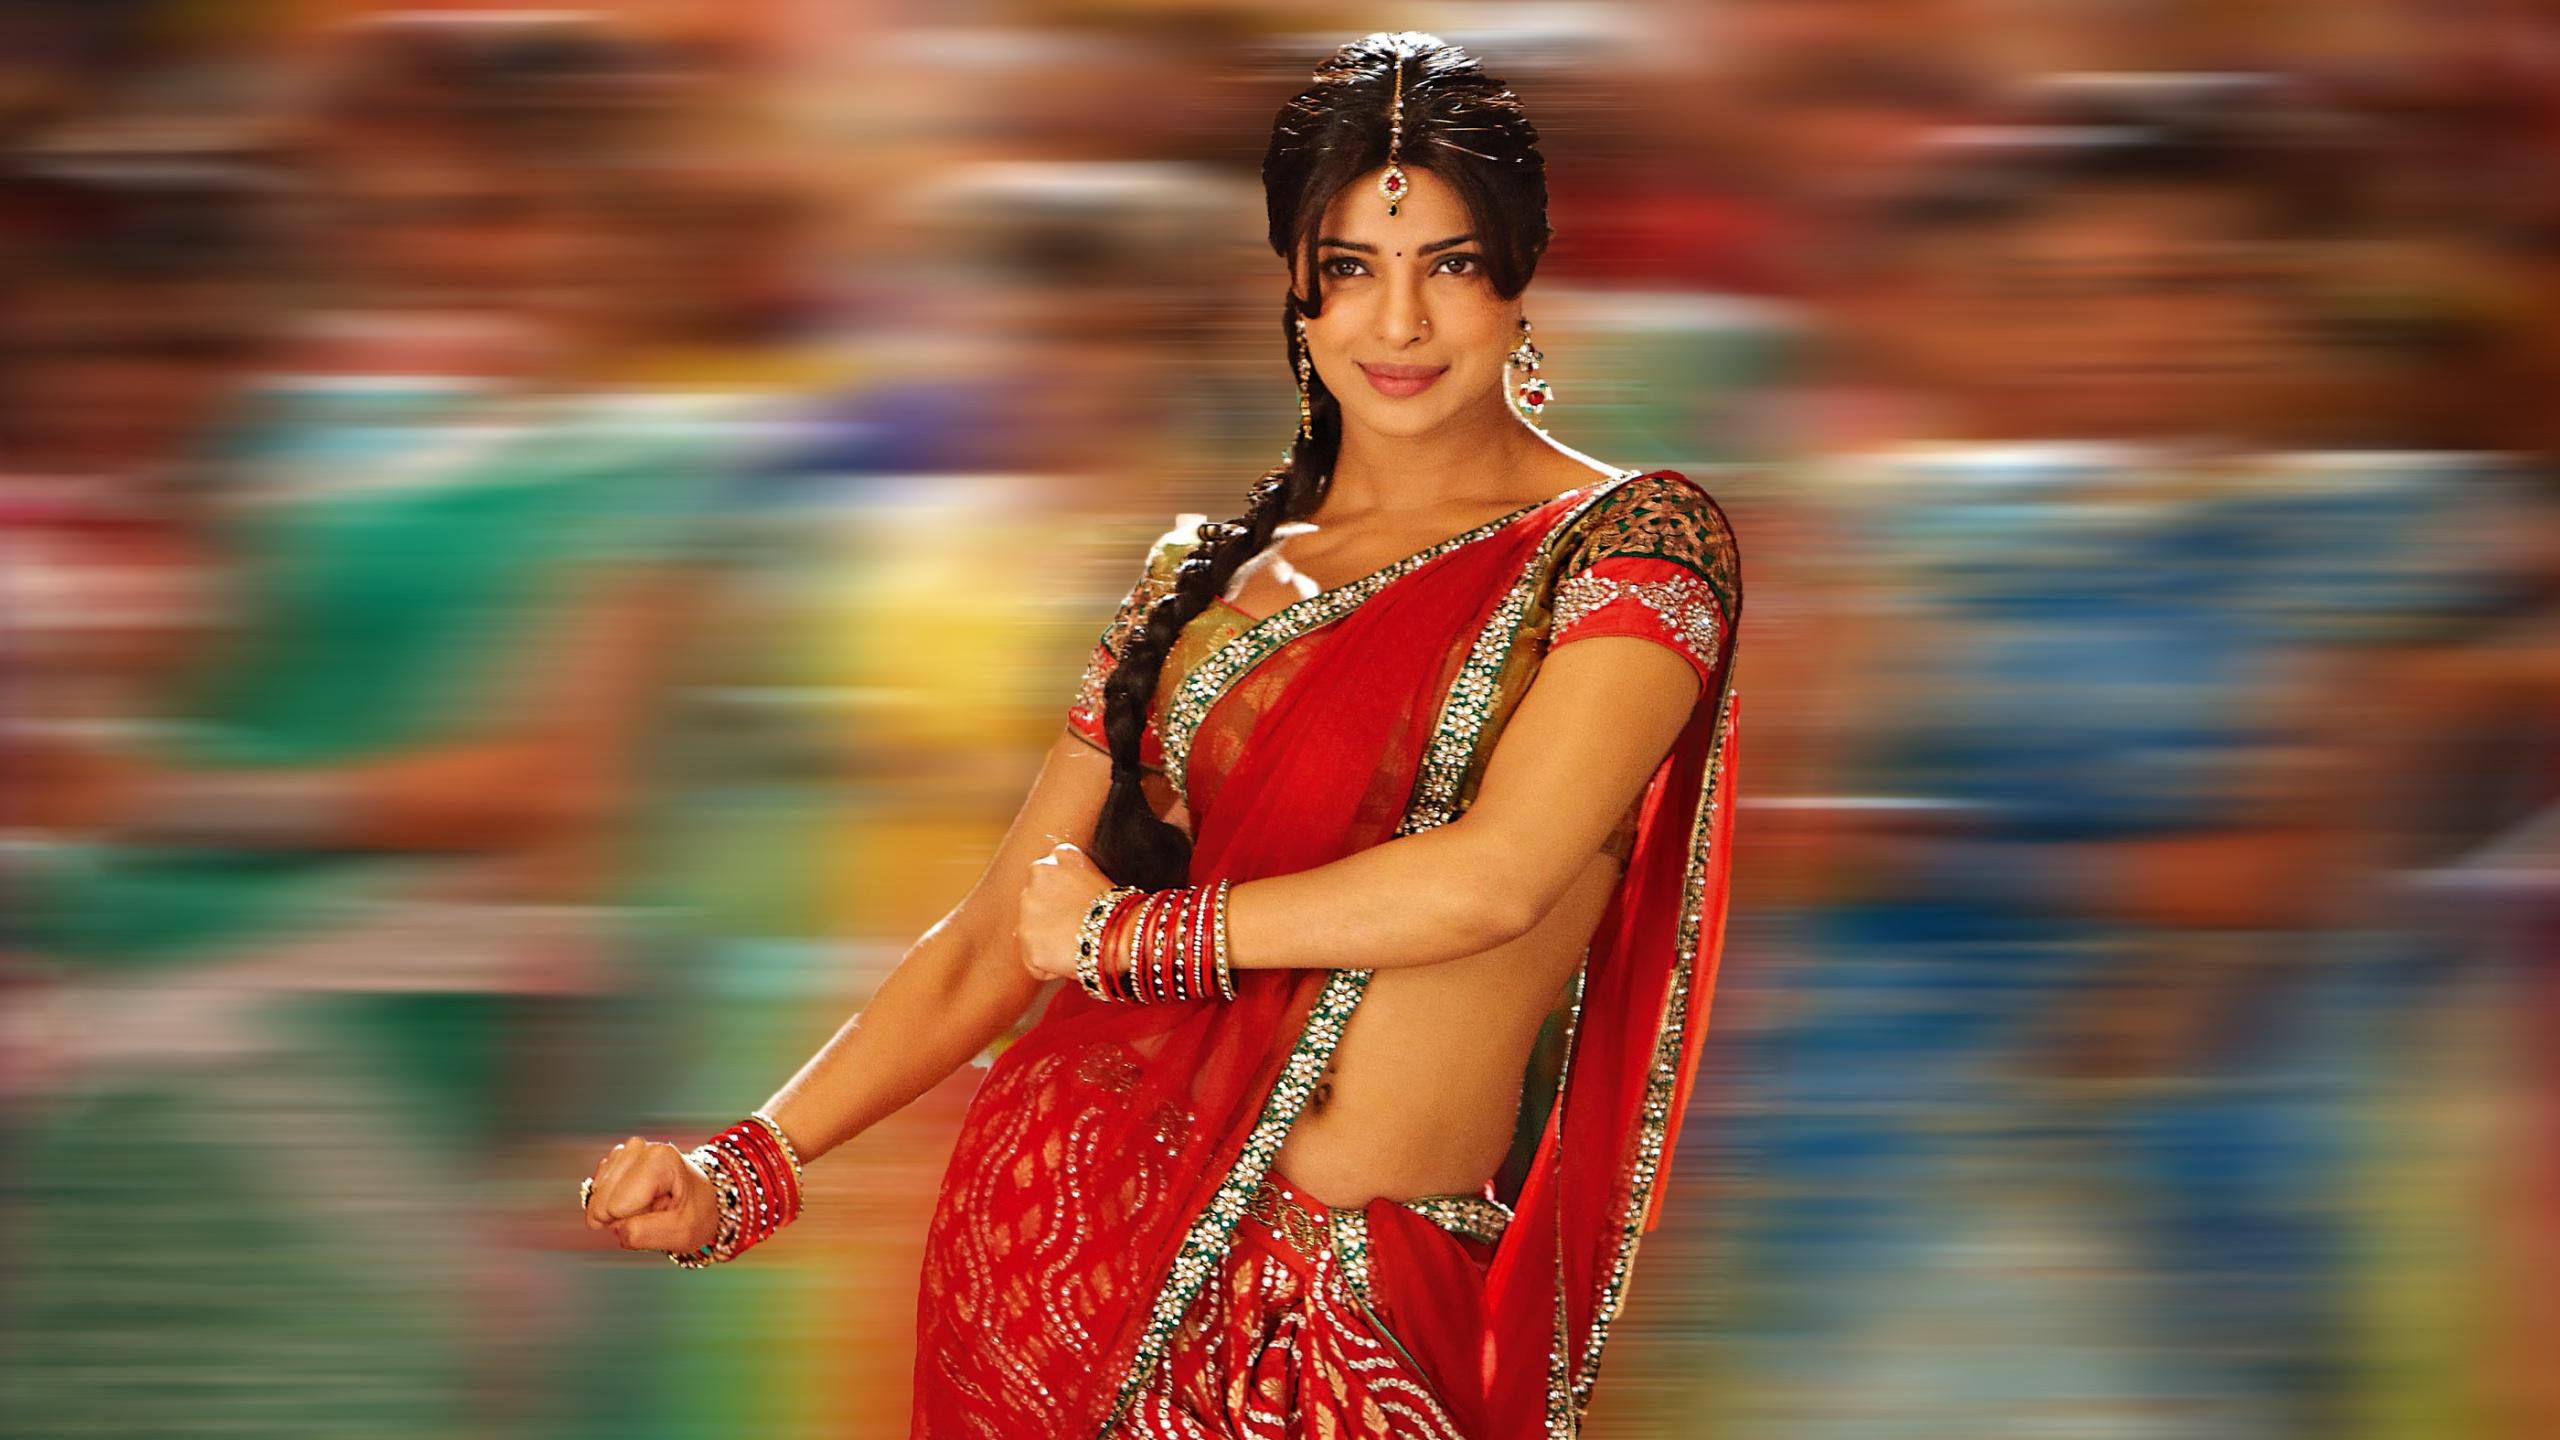 priyanka chopra full hd wallpaper and background image | 2560x1440